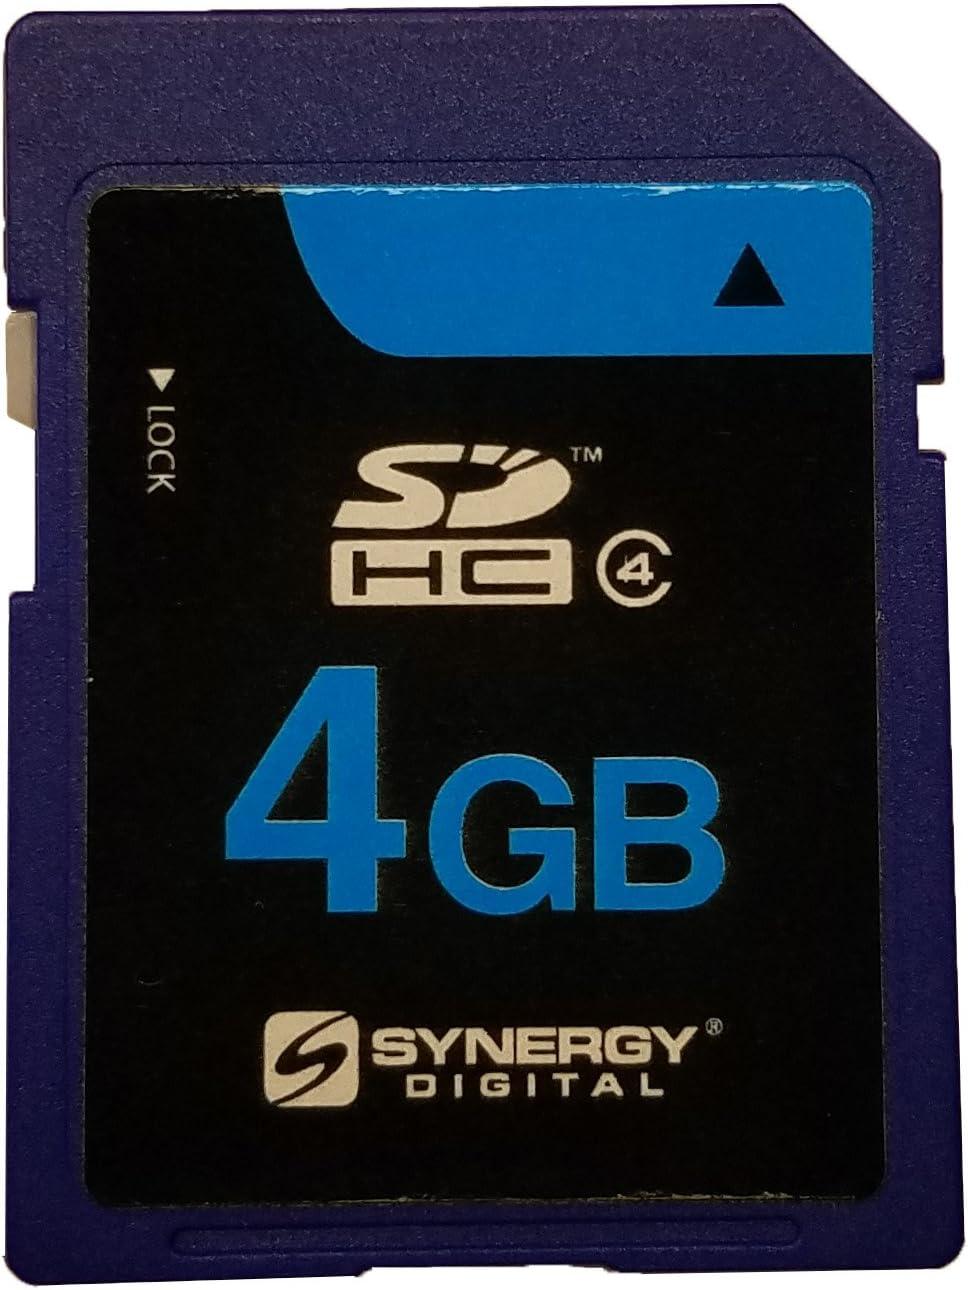 Canon Powershot A560 Digital Camera Memory Card 4GB Secure Digital High Capacity (SDHC) Memory Card